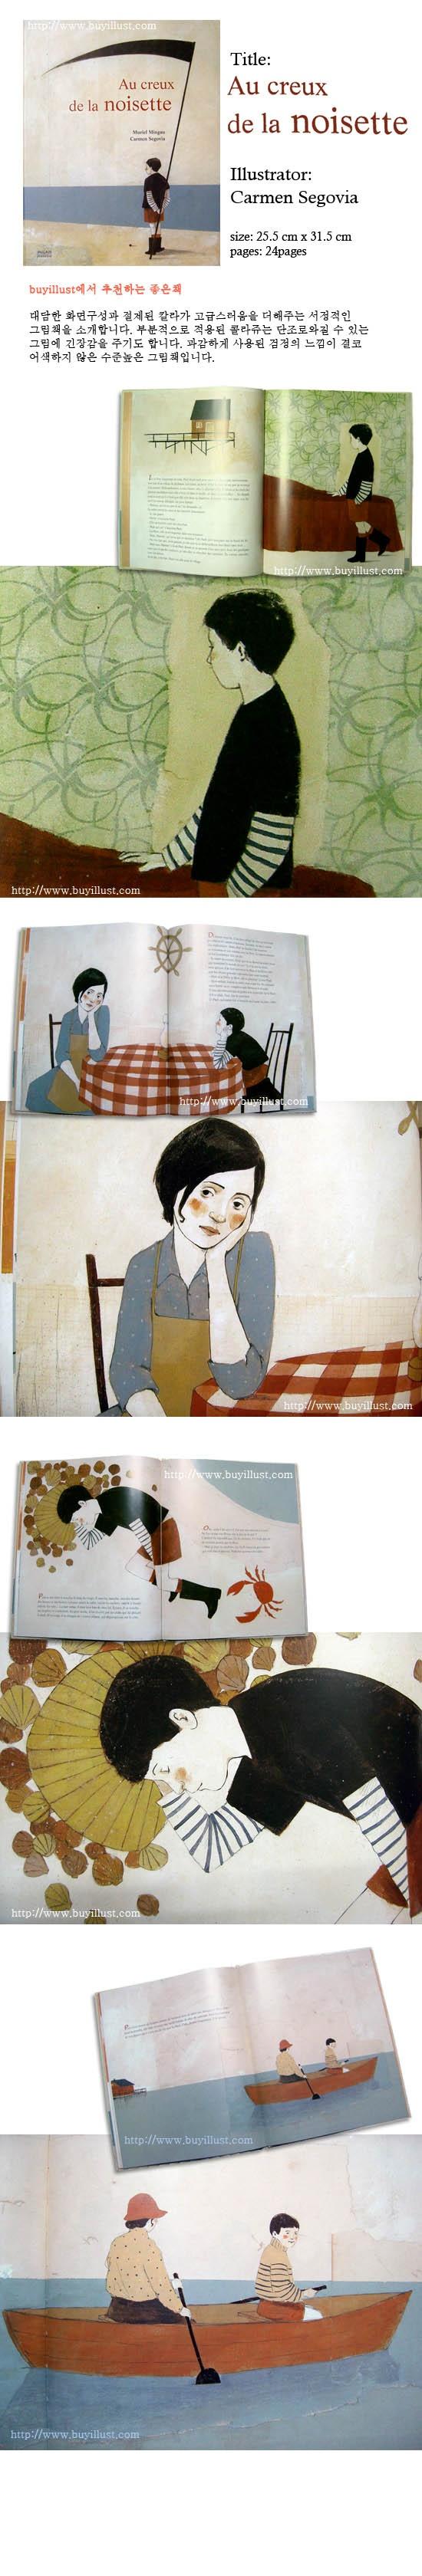 au creux de la noisette - Carmen Segovia  One of my favourite children's books